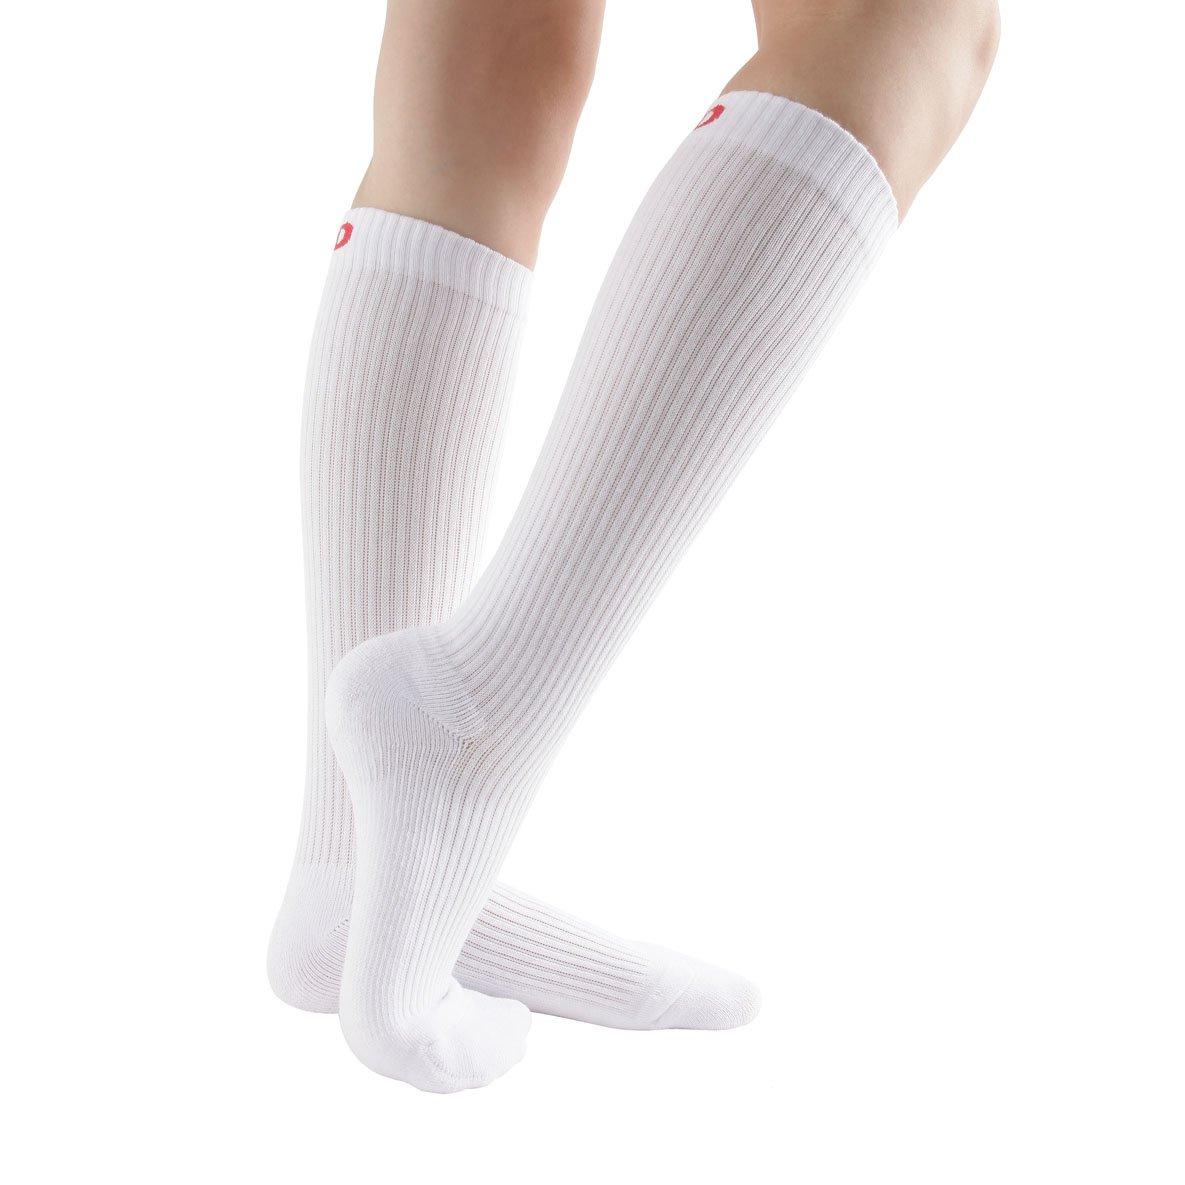 Anti-DVT Athletic Varicose Veins 6 Pairs Compression Socks Edema Shin Splints 3Black3WhiteM for Women /& Men Cushion Knee High Socks for Running 8-15mmHg Travels Nurses Medical